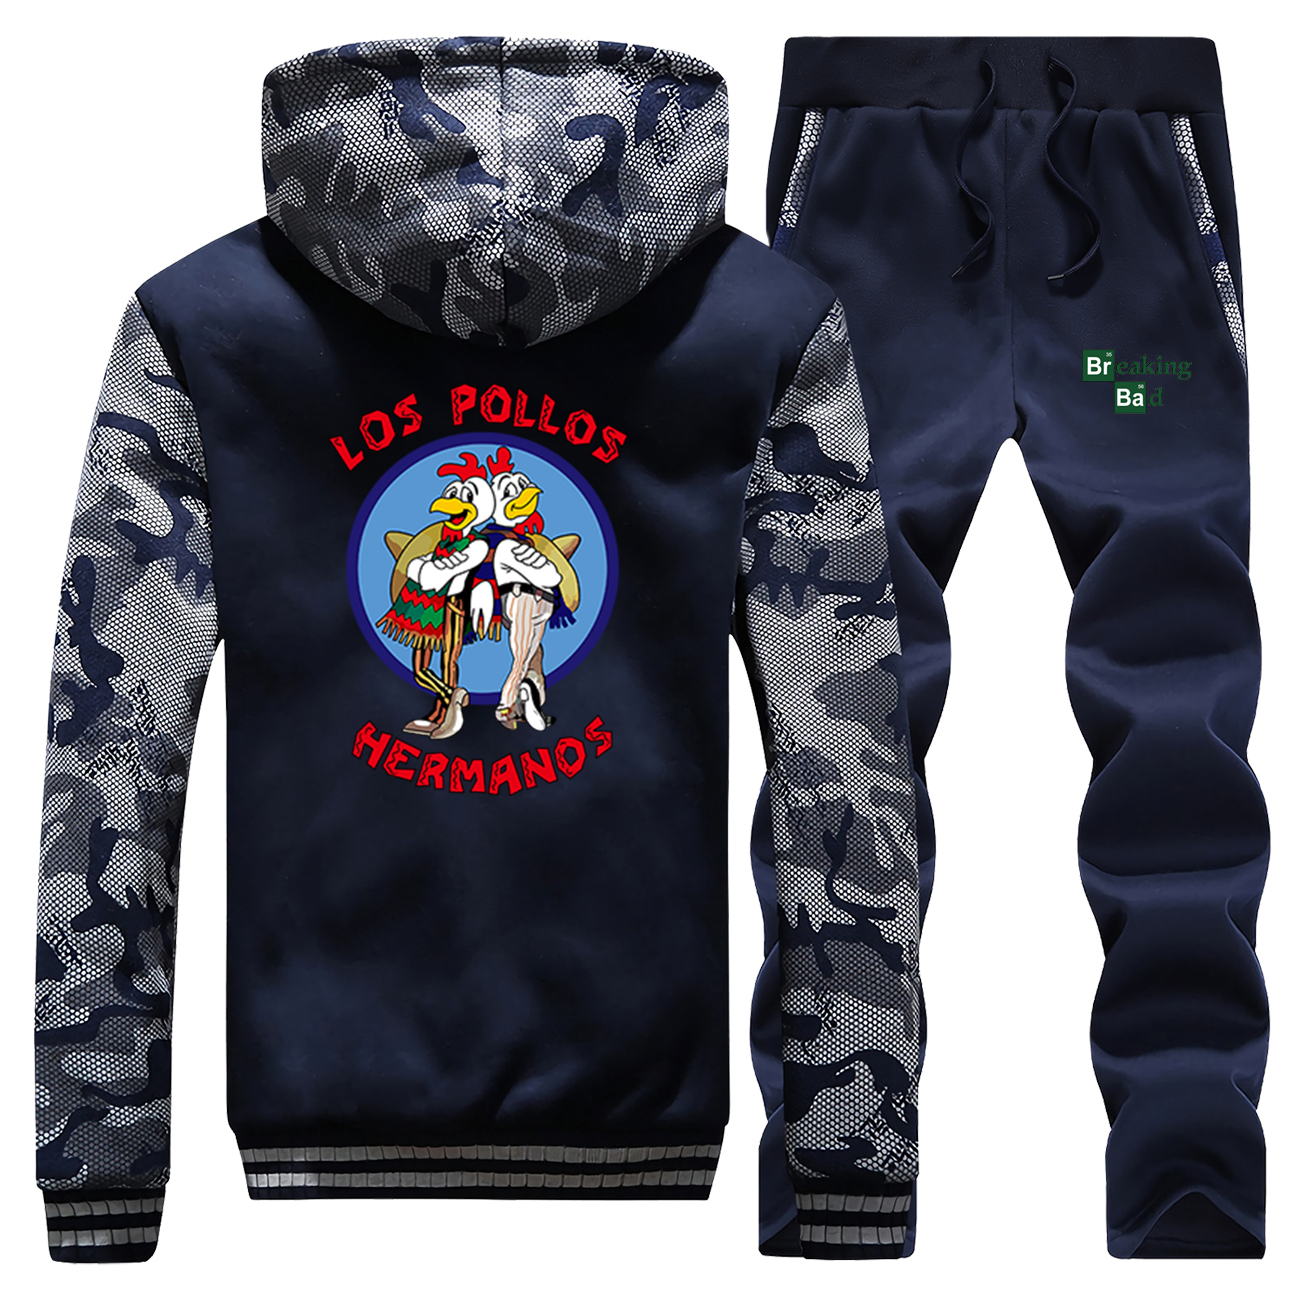 Funny Breaking Bad Los Pollos Hermanos Chicken Brothers Camo Sweatshirt Hoodies Pants Sets Men Casual Sportswear Streetwear